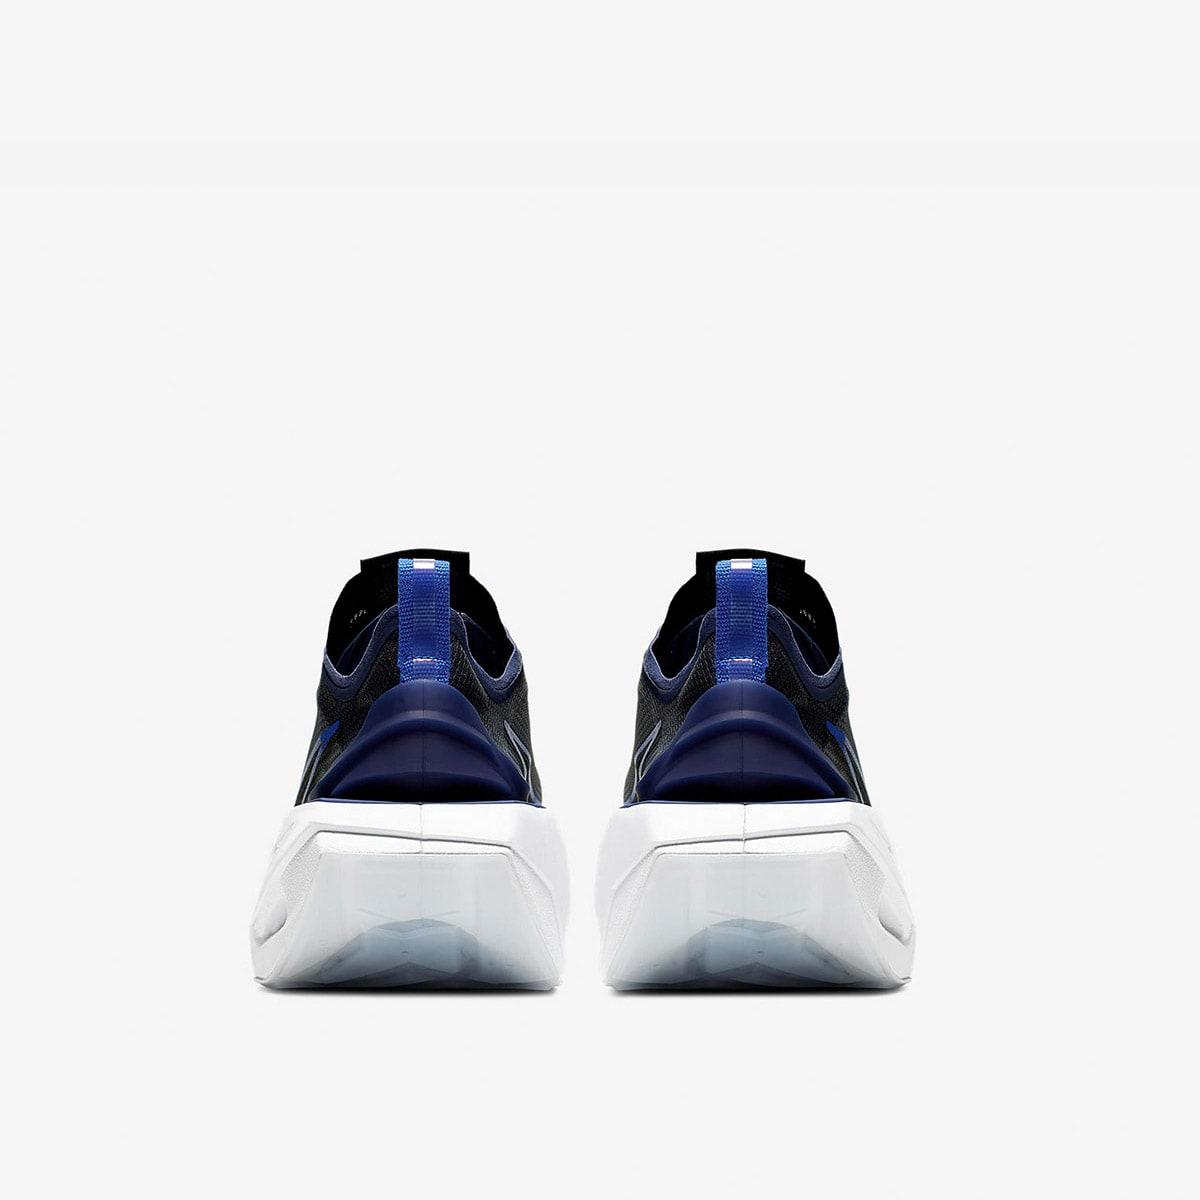 Nike Zoom X Vista Grind - BQ4800-500